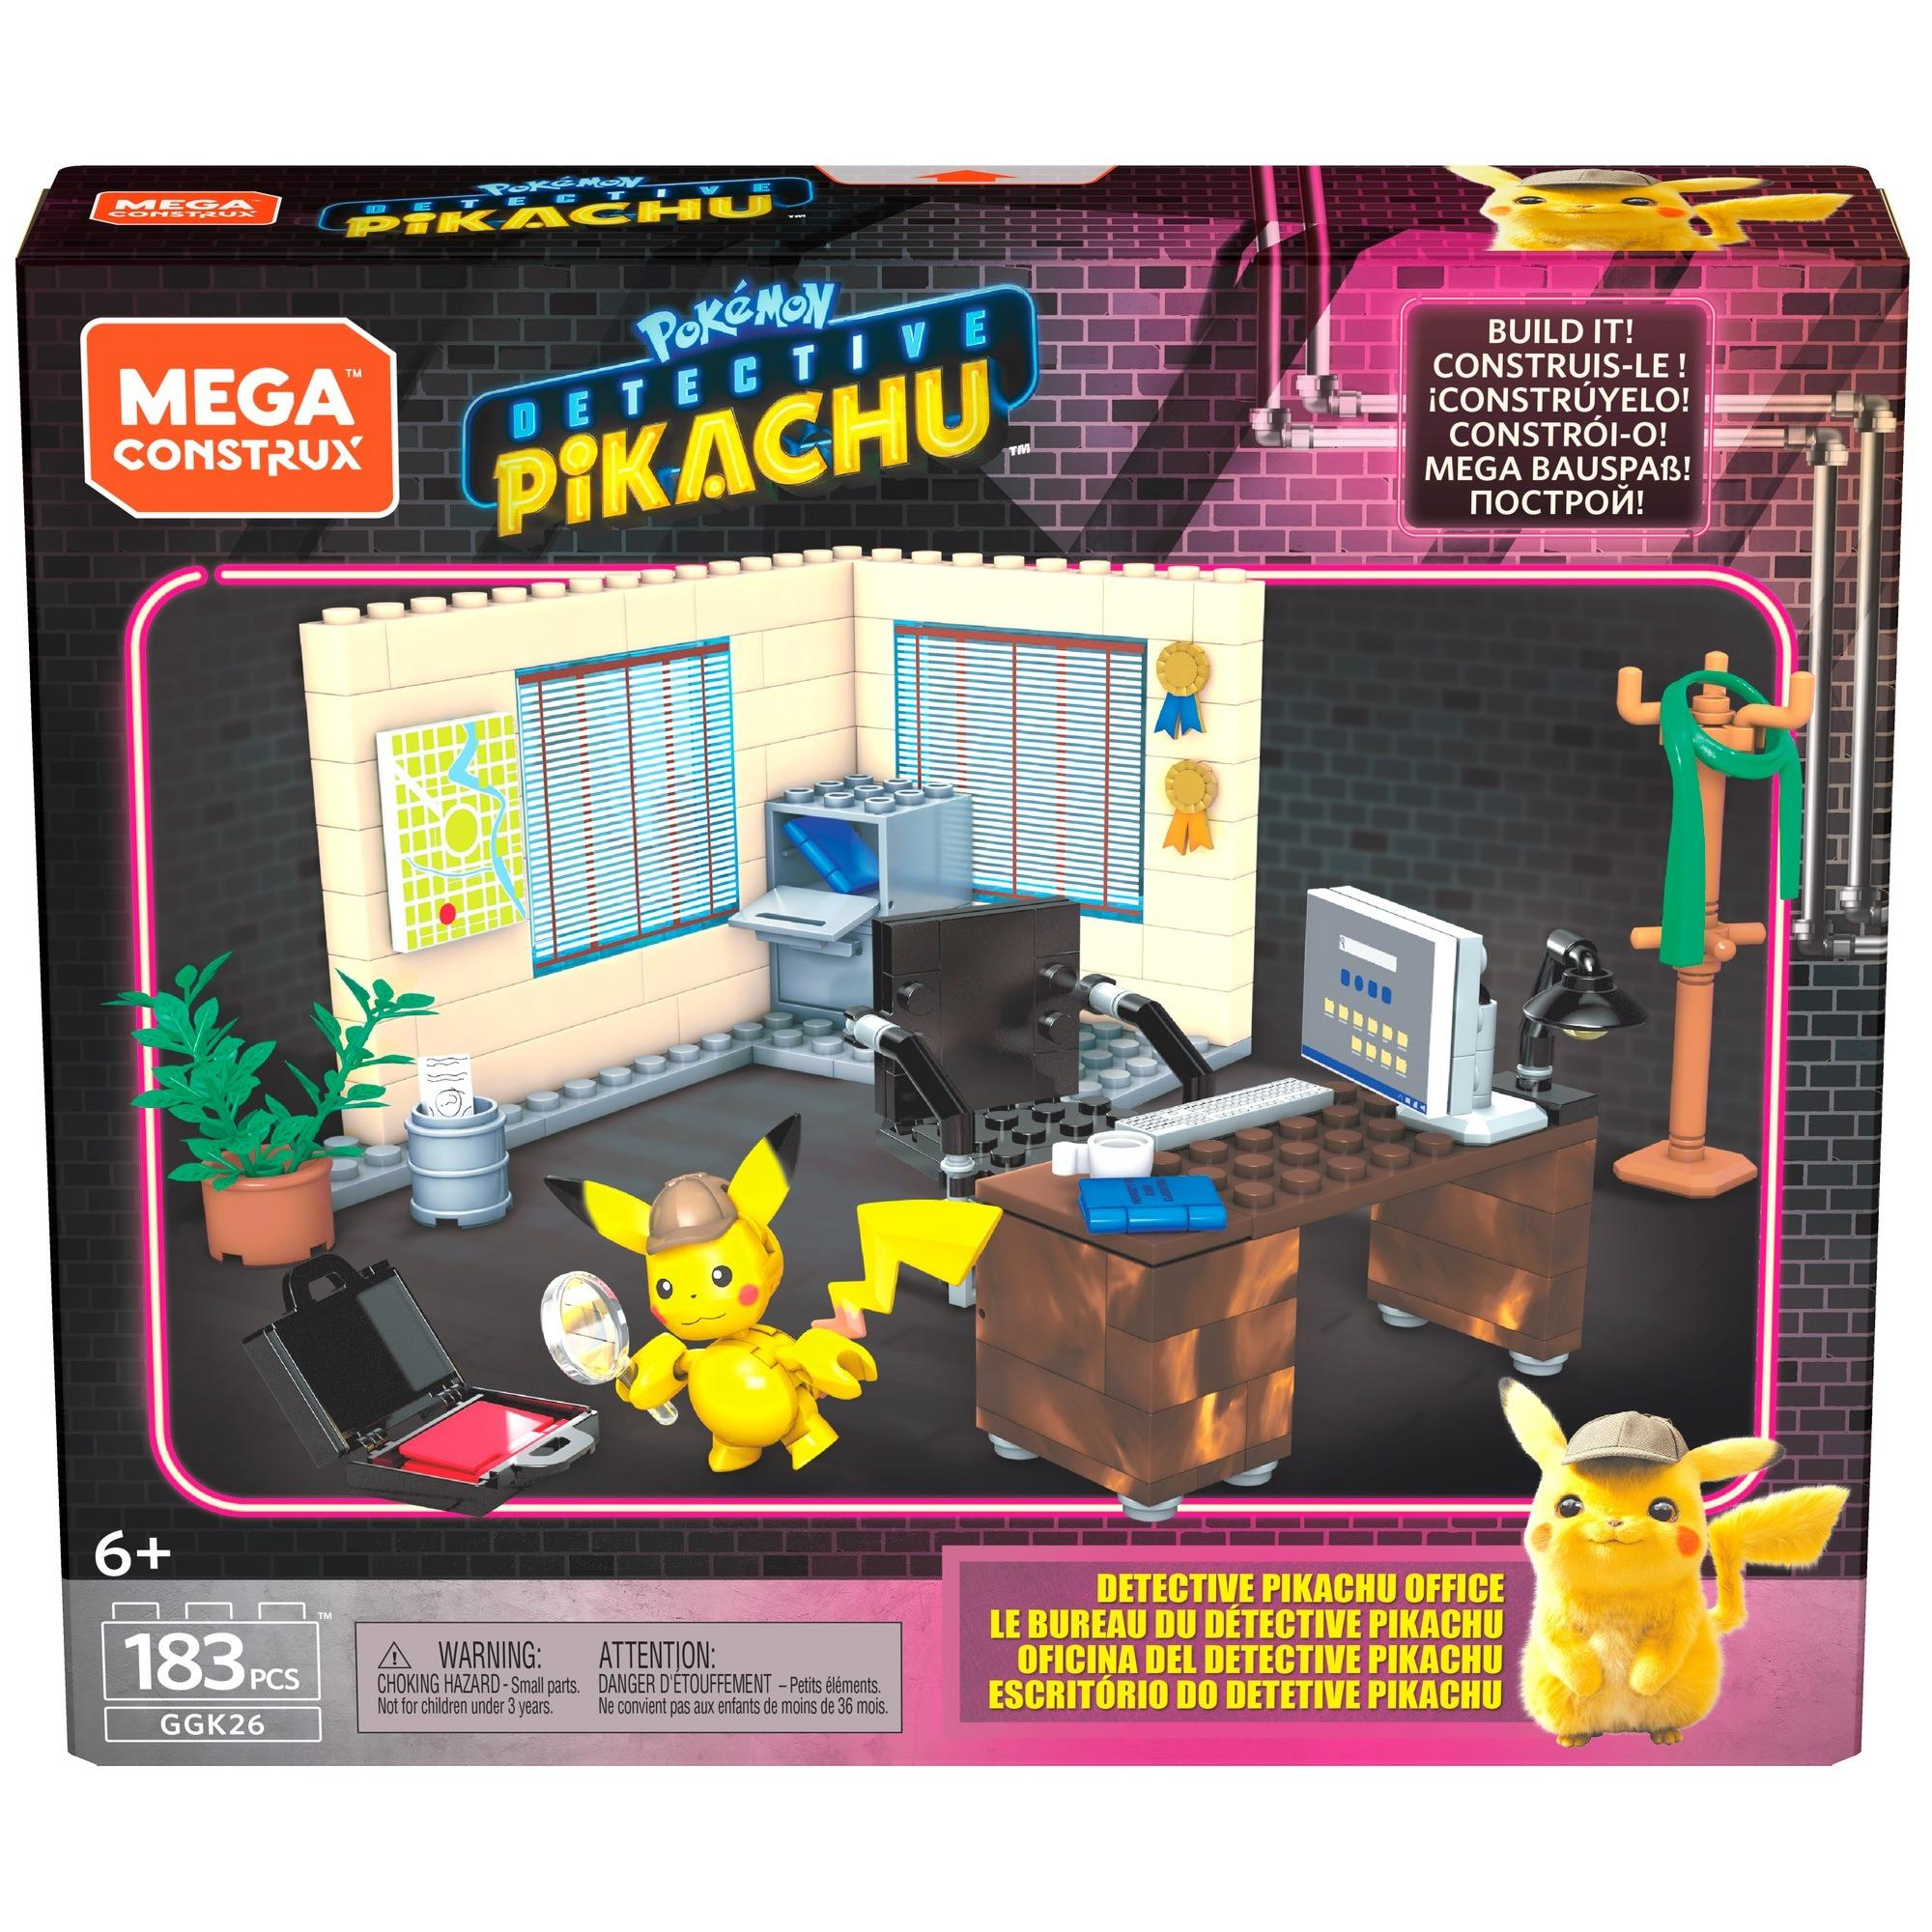 Mega Construx Pokemon Detective Pikachu Detective Pikachu's Office by Mattel